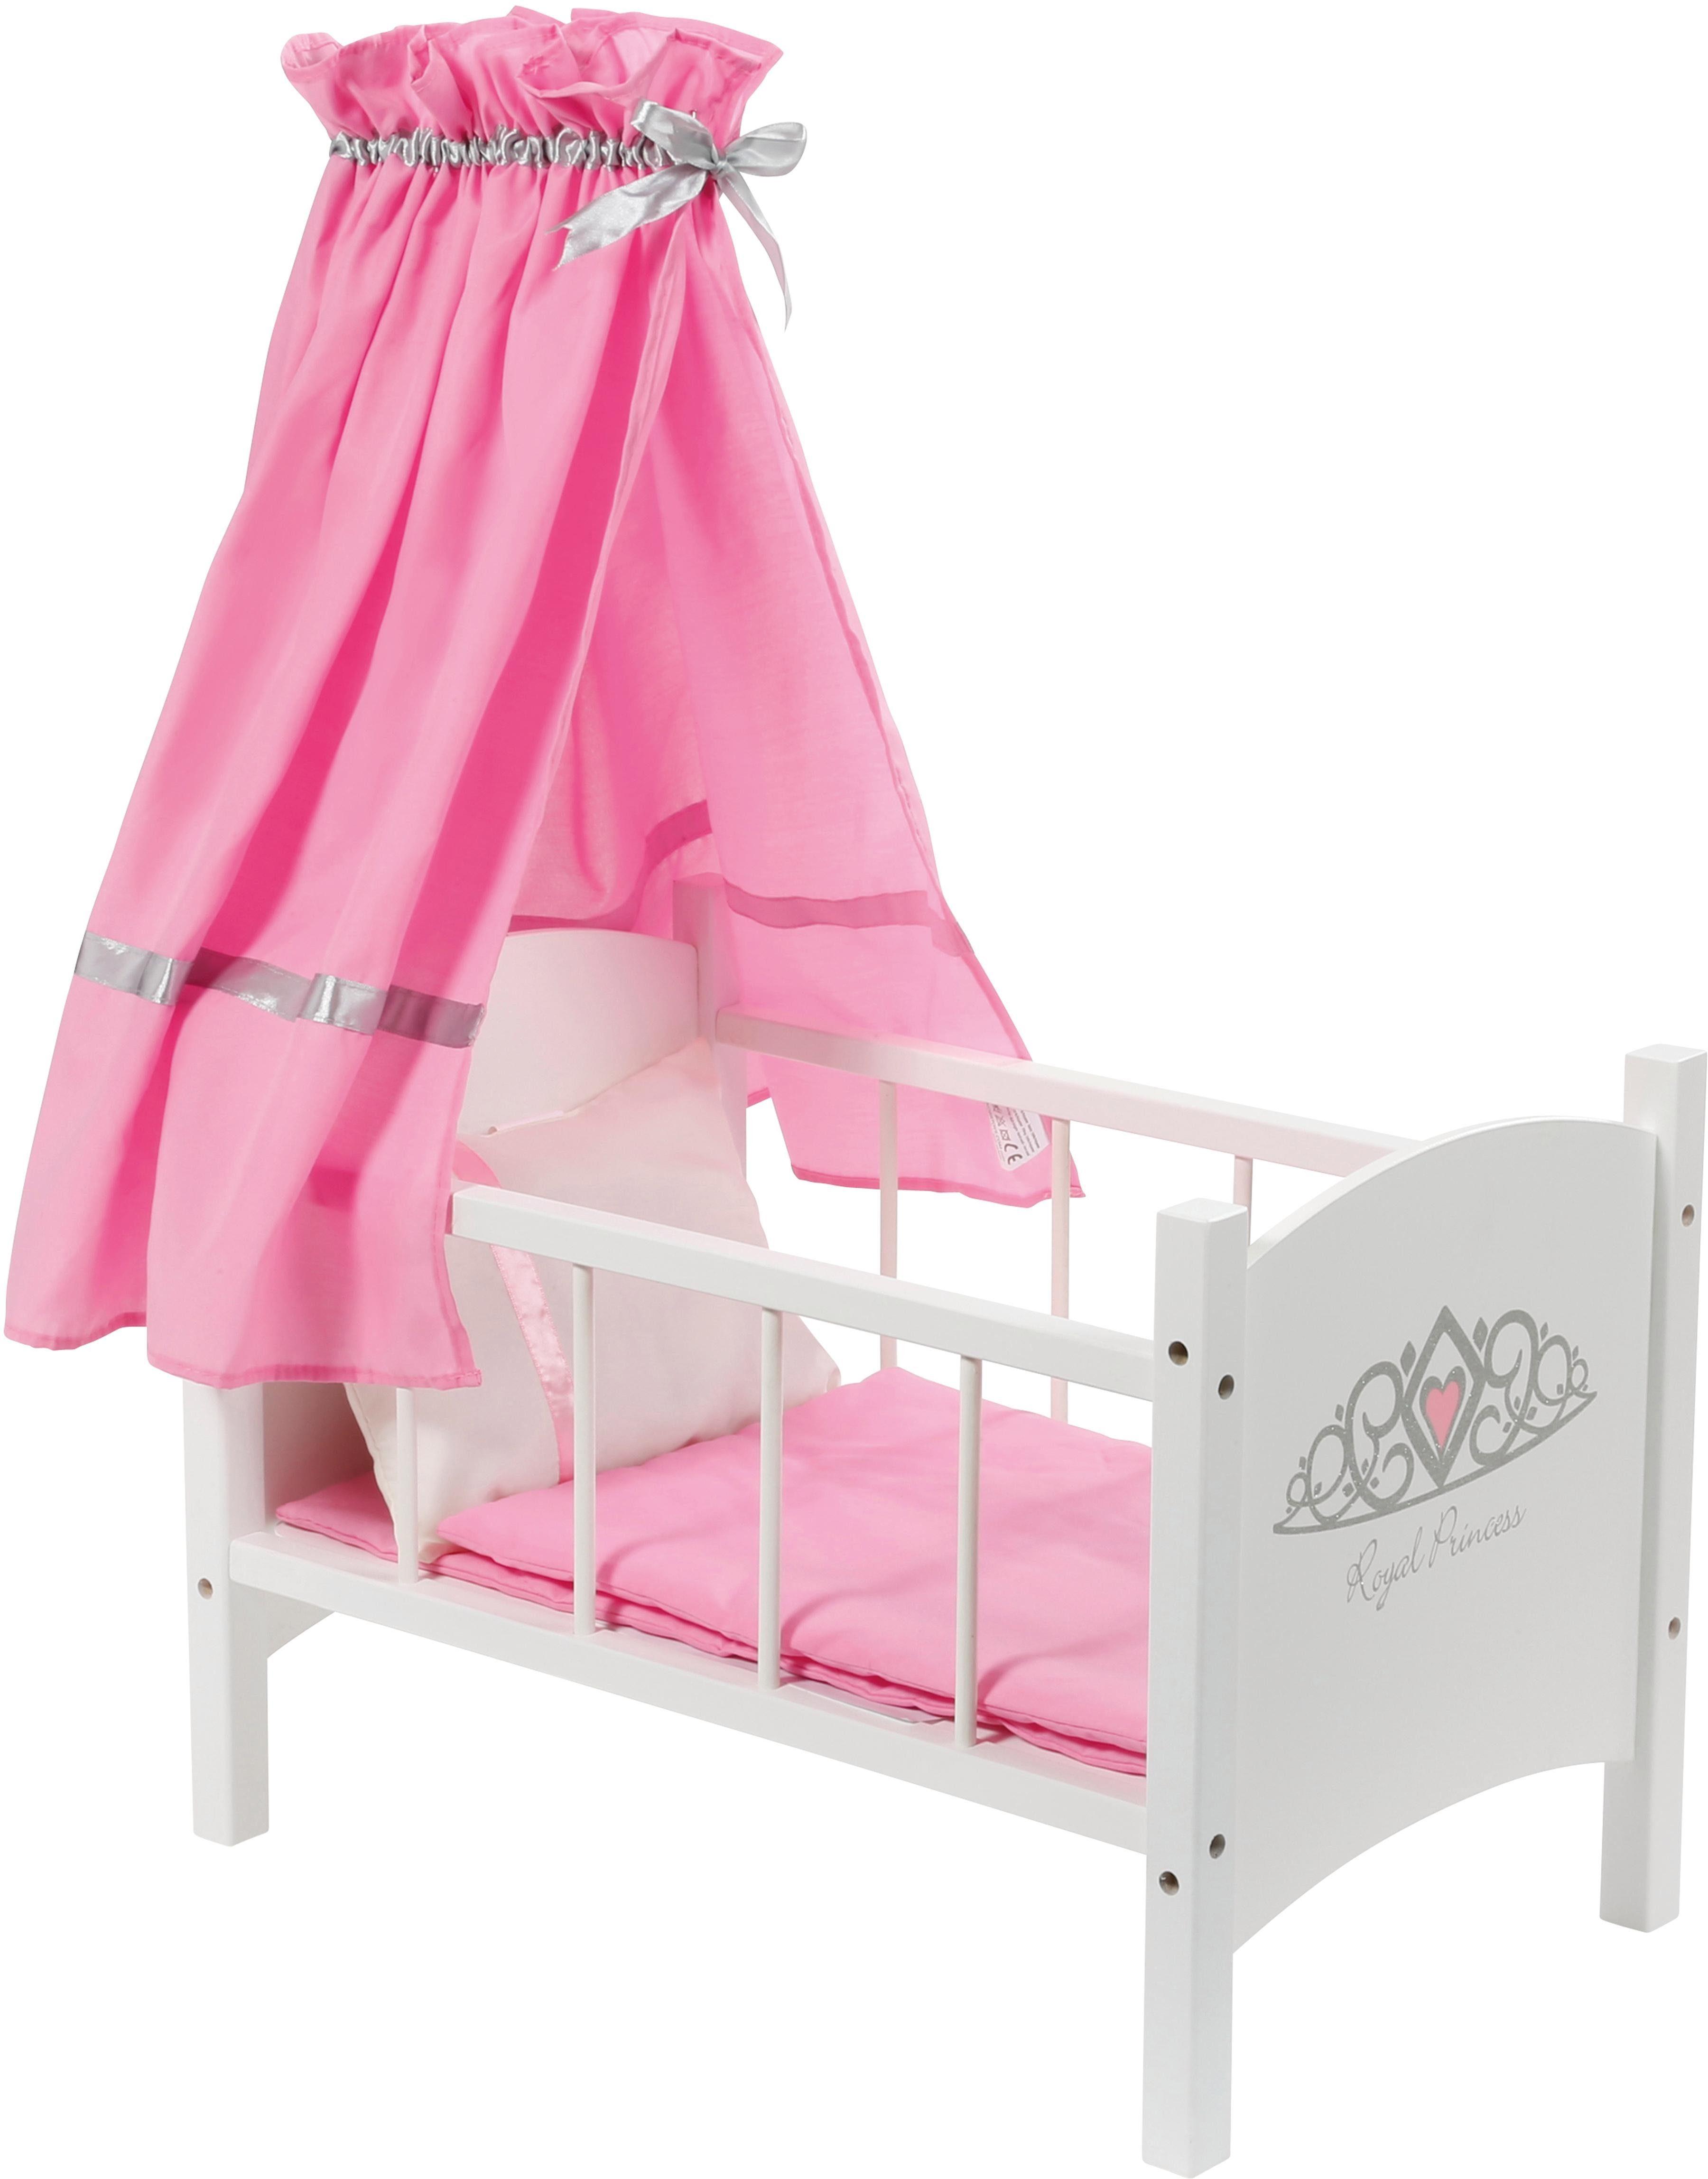 knorr toys Puppenhimmelbett, »royale princess«